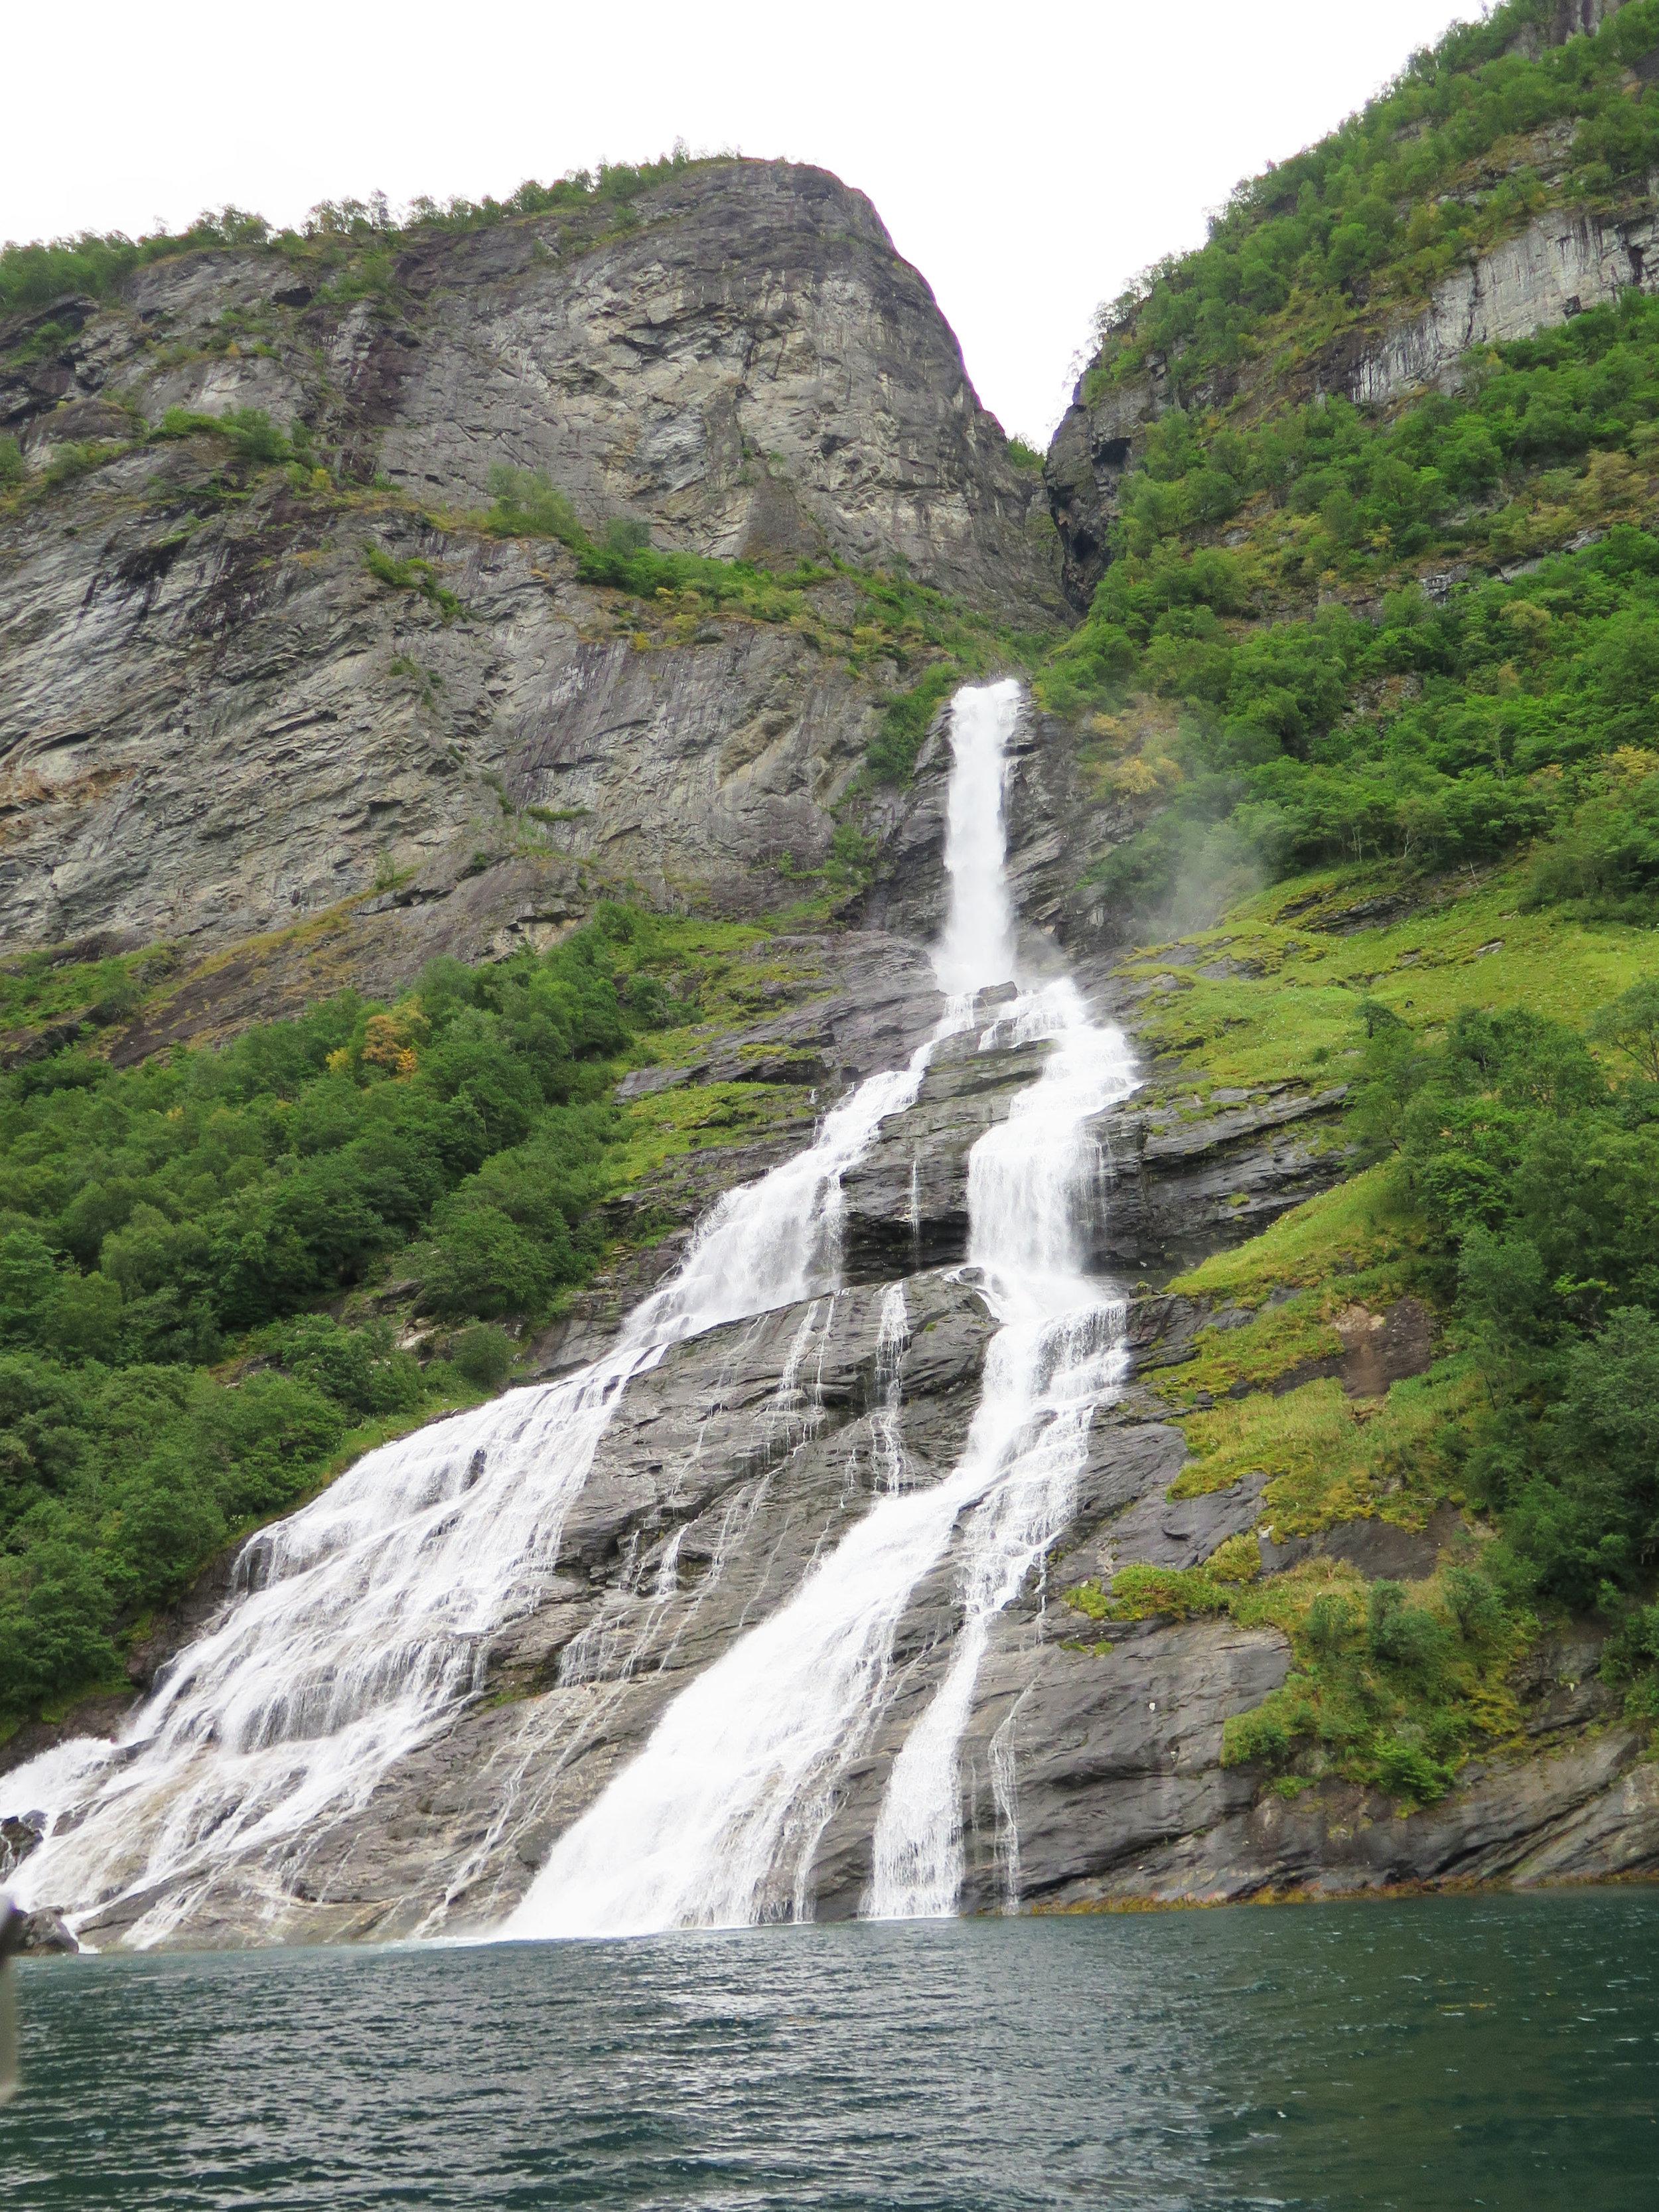 Geirnager Waterfall